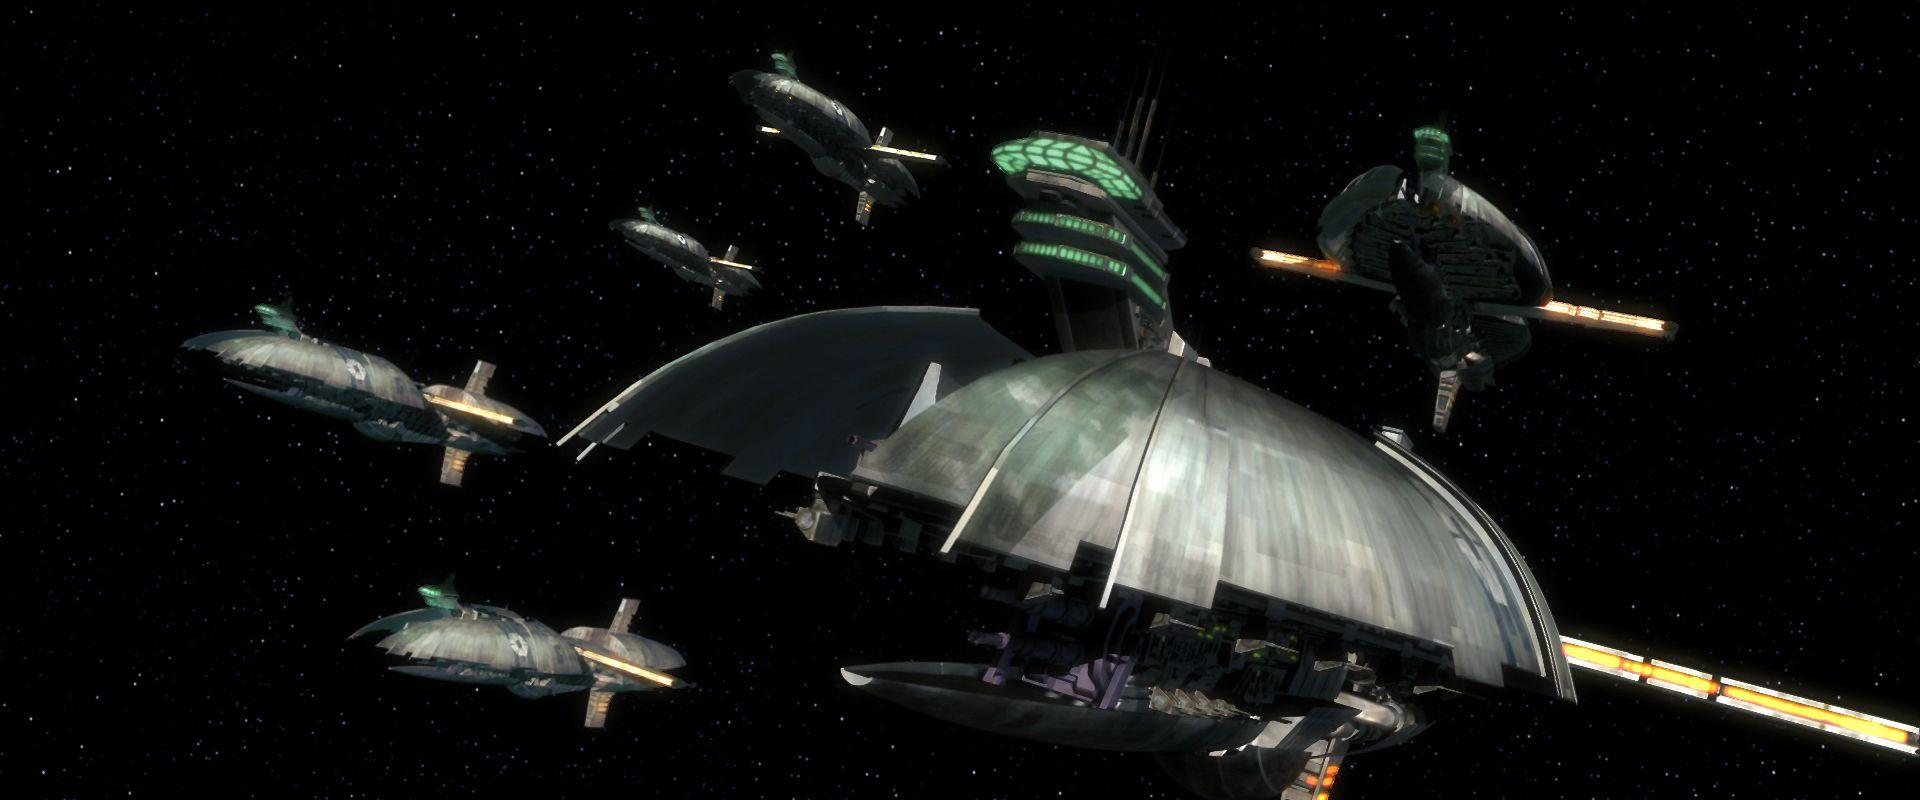 cis starships Google Search Star wars wallpaper, Star